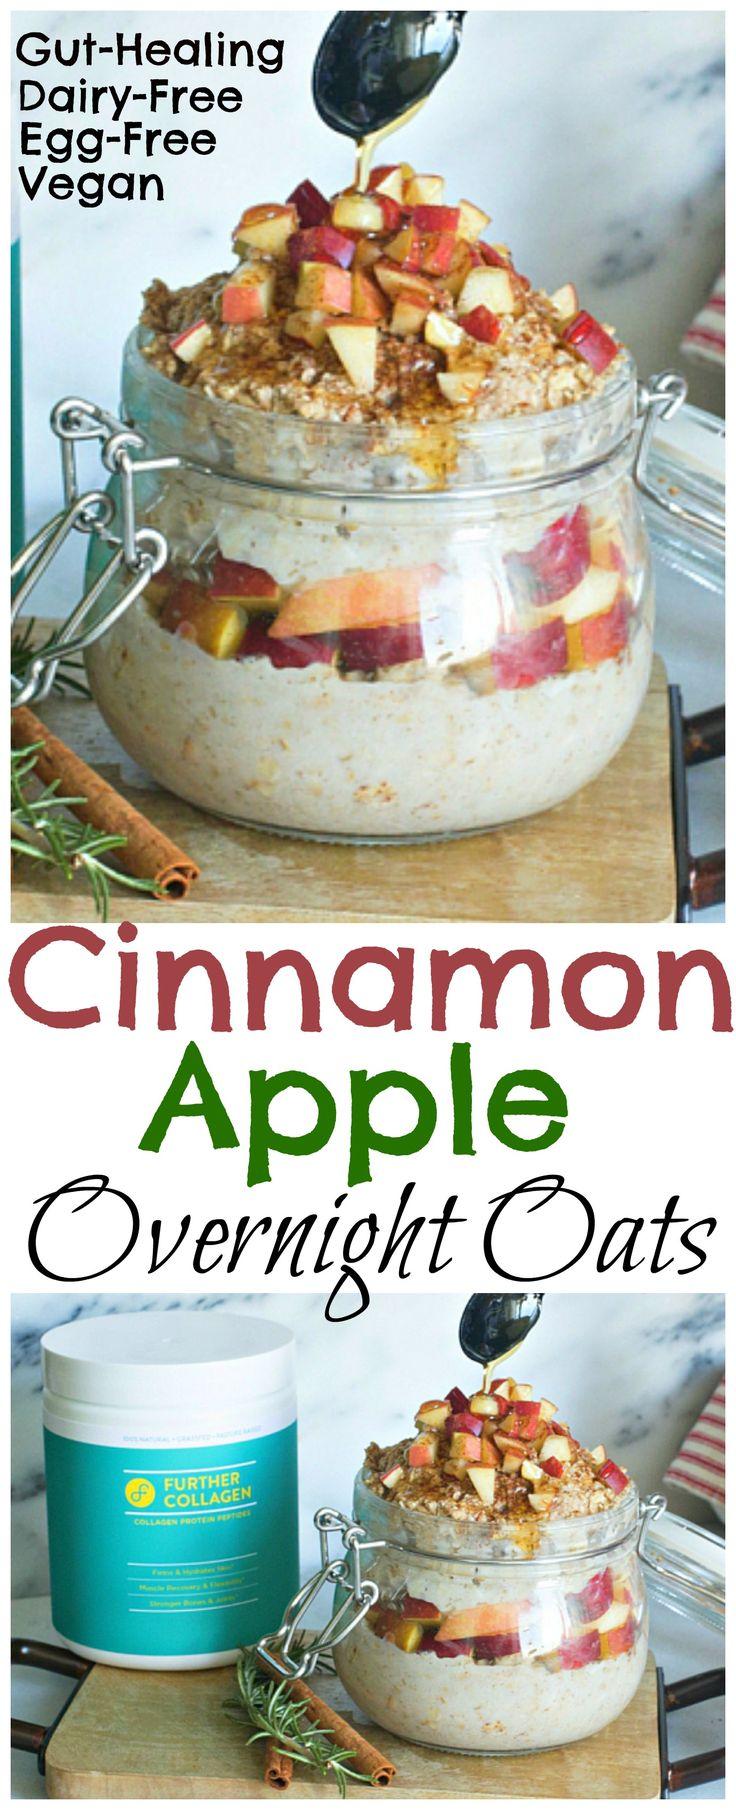 http://www.furtherfood.com/recipe/cinnamon-apple-overnight-oats-collagen/